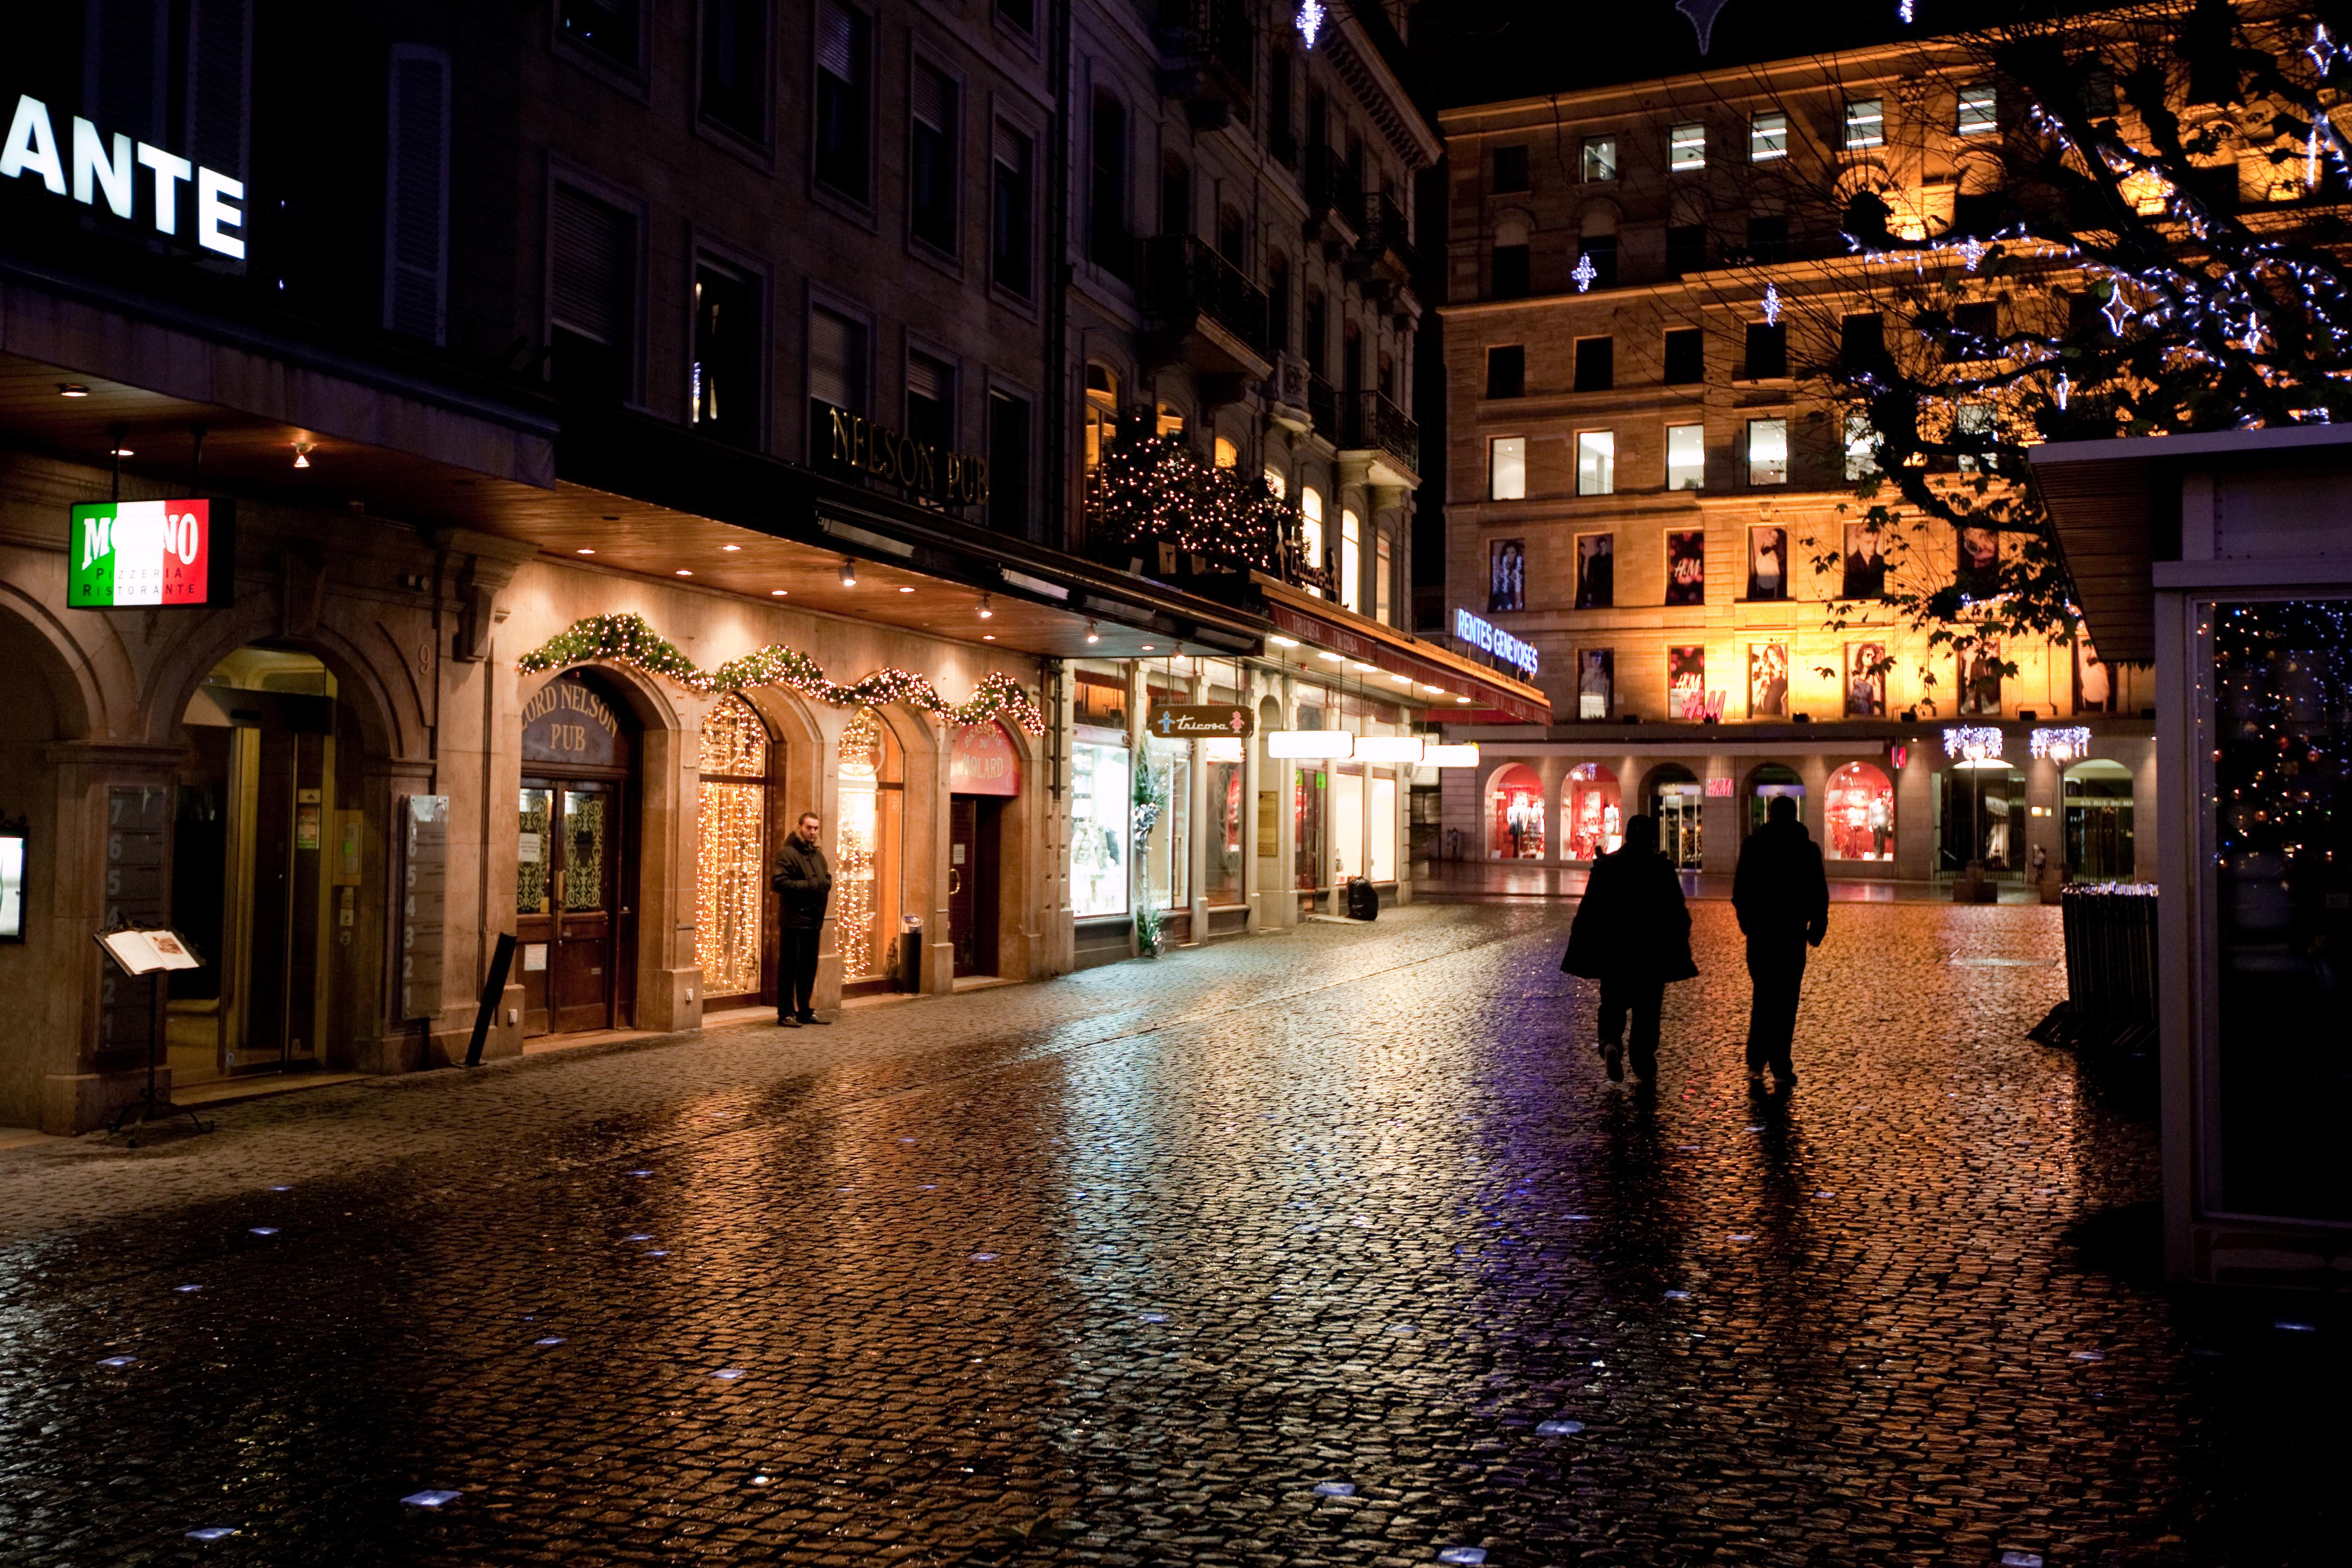 File:Geneva street in the rain.jpg - Wikimedia Commons